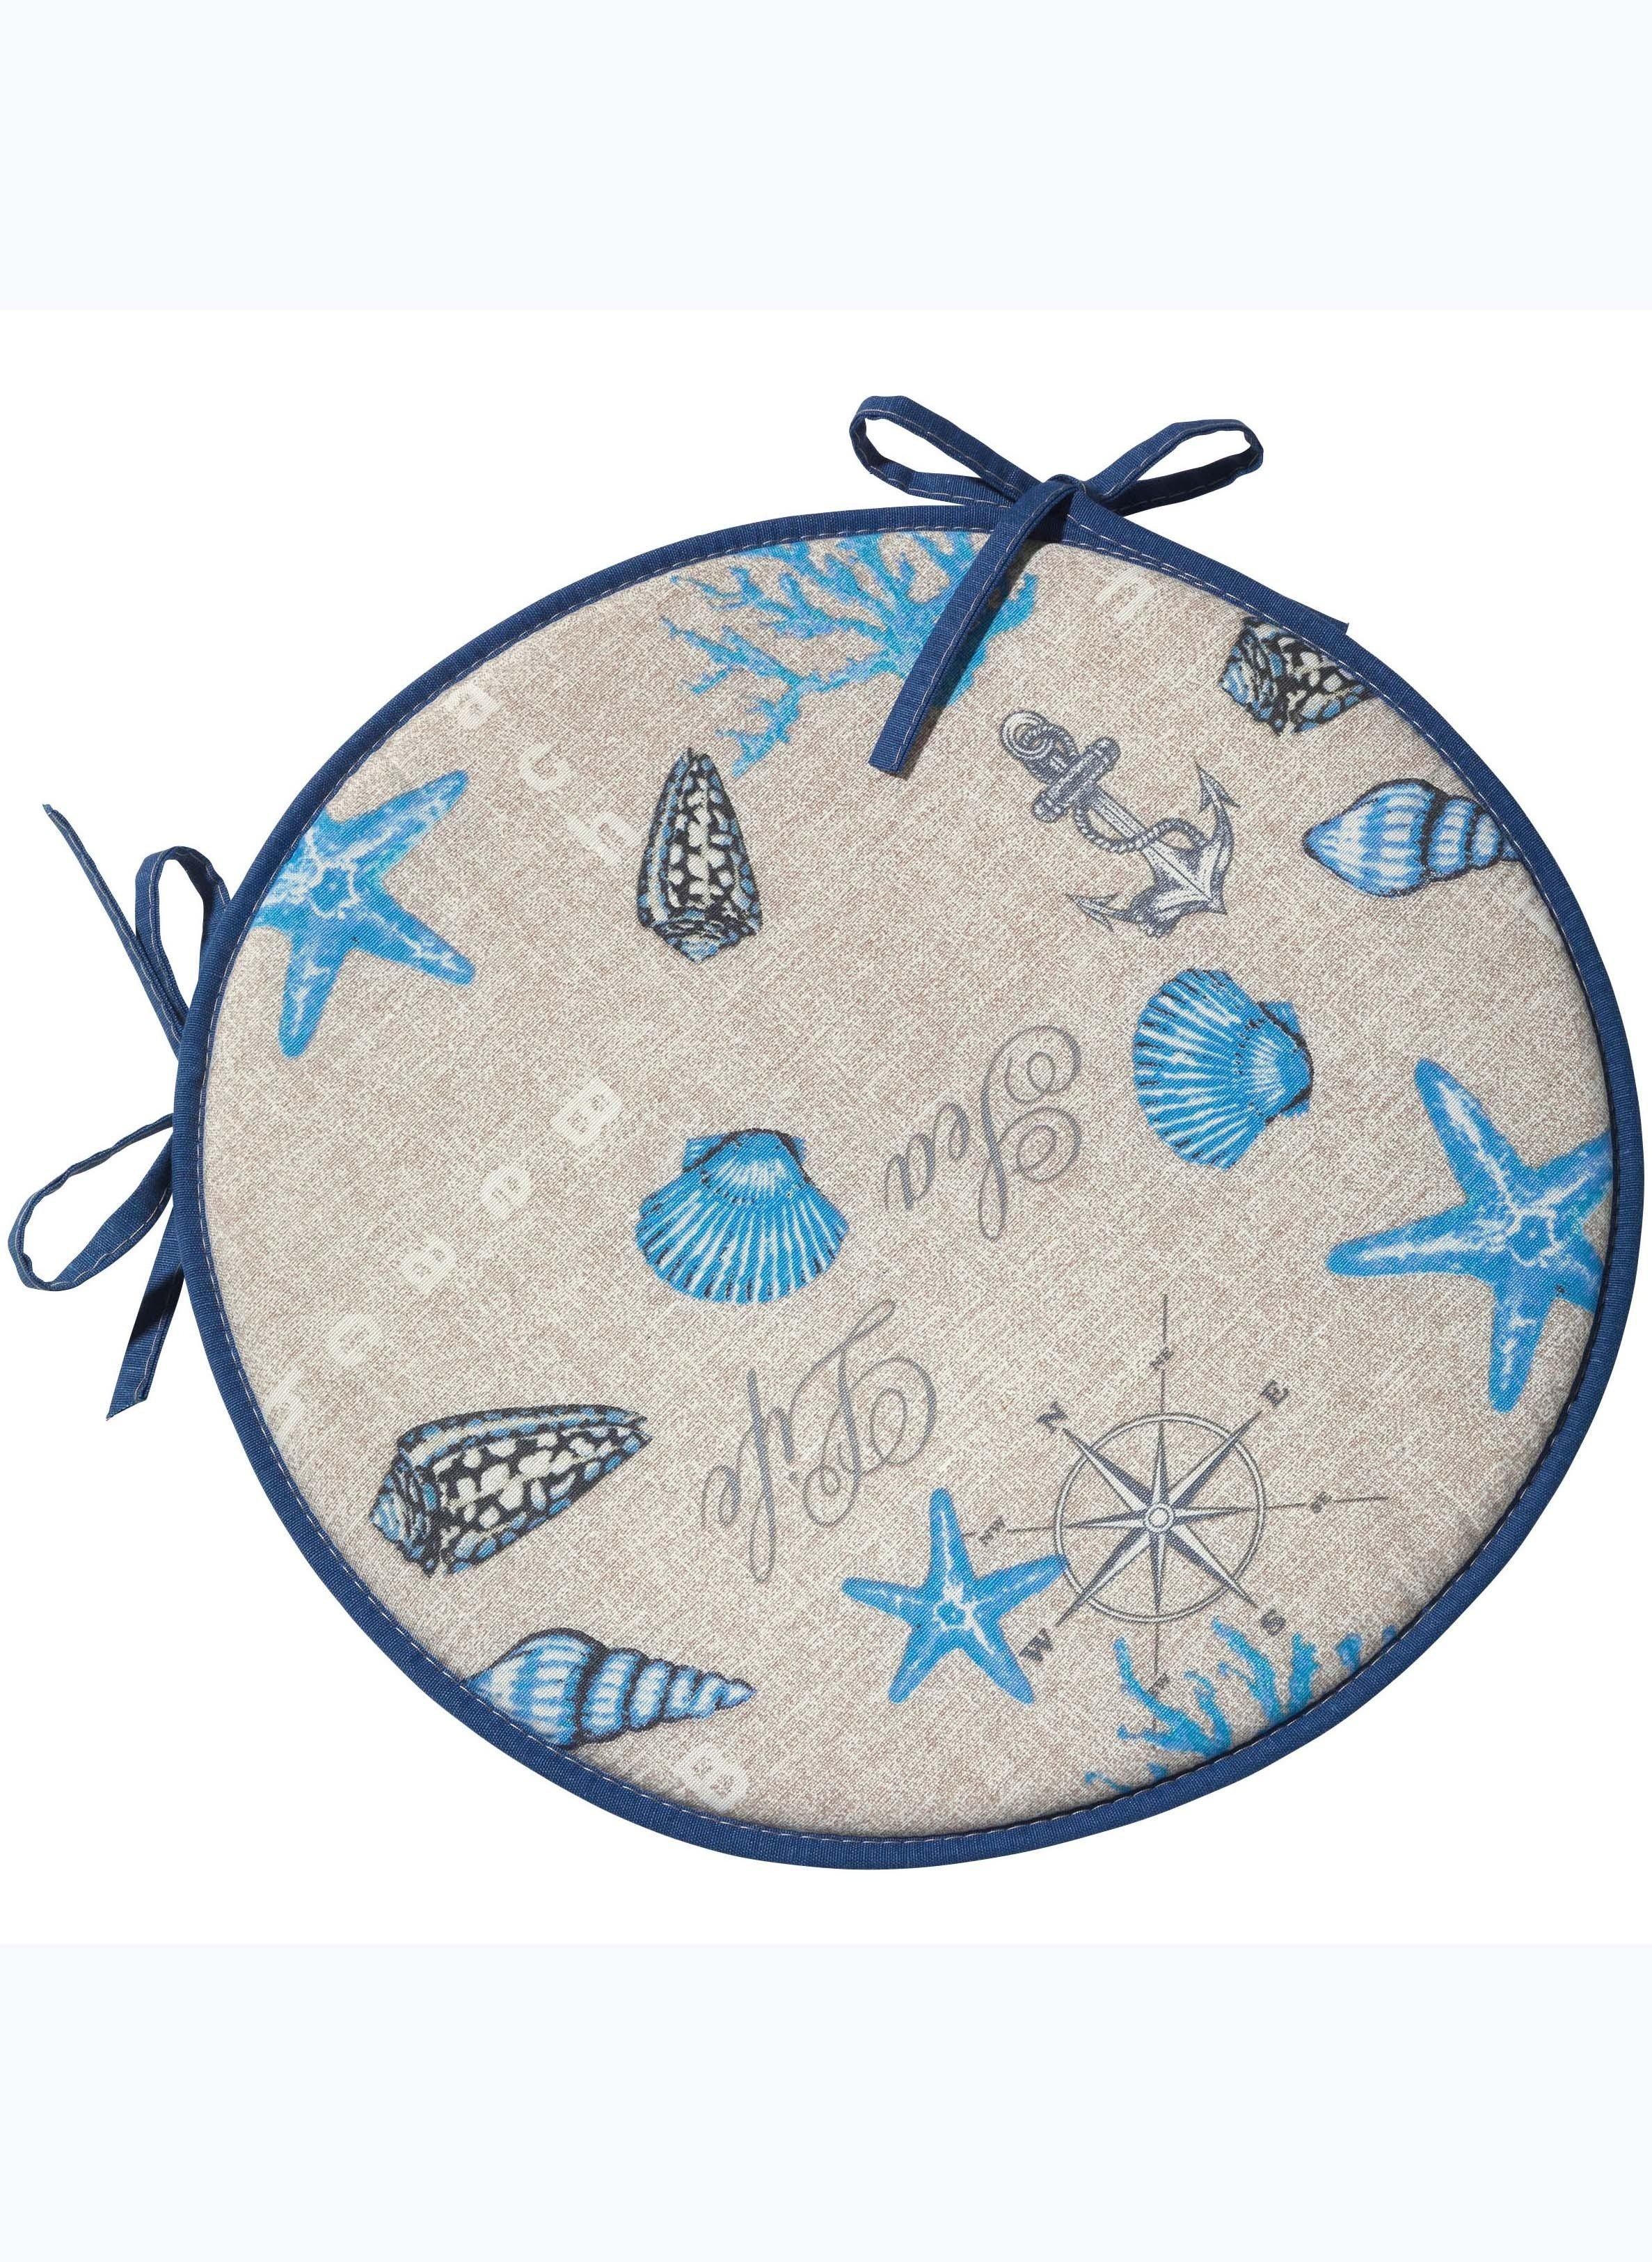 Coussin-rond Étoil.mer bleu 2p